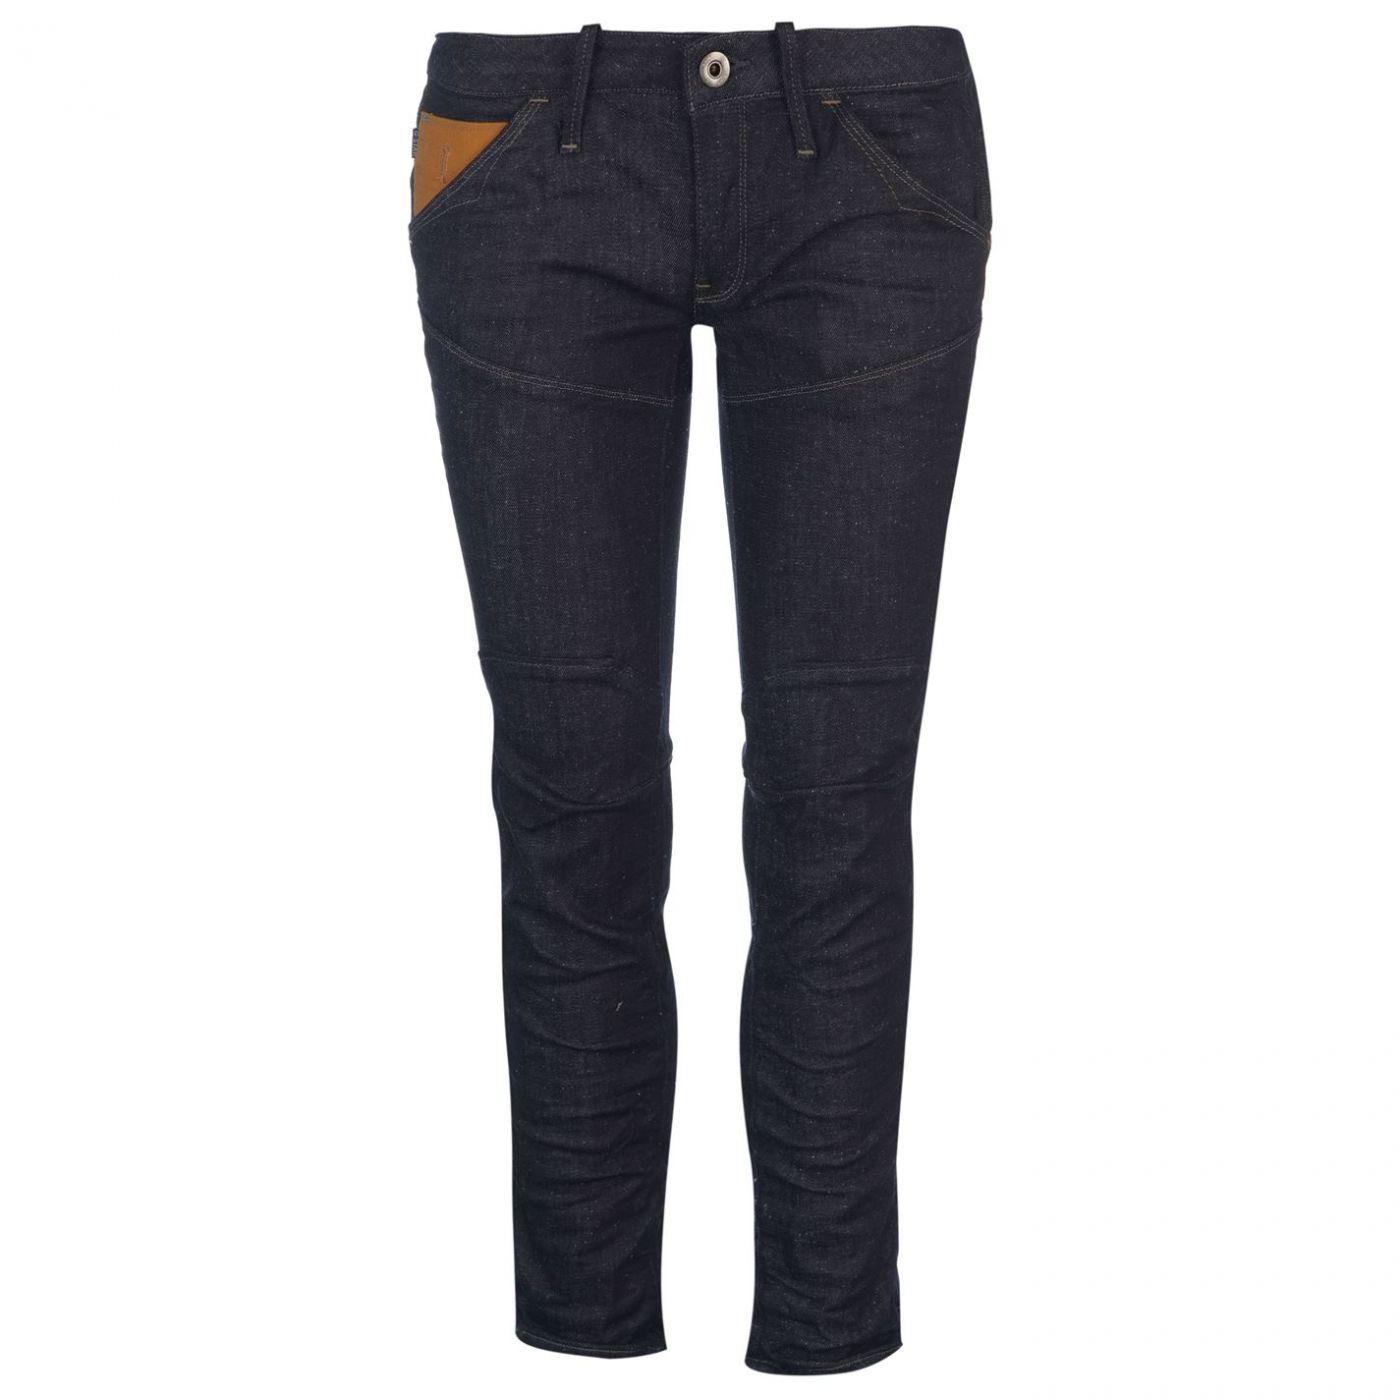 G Star 60697 Jeans